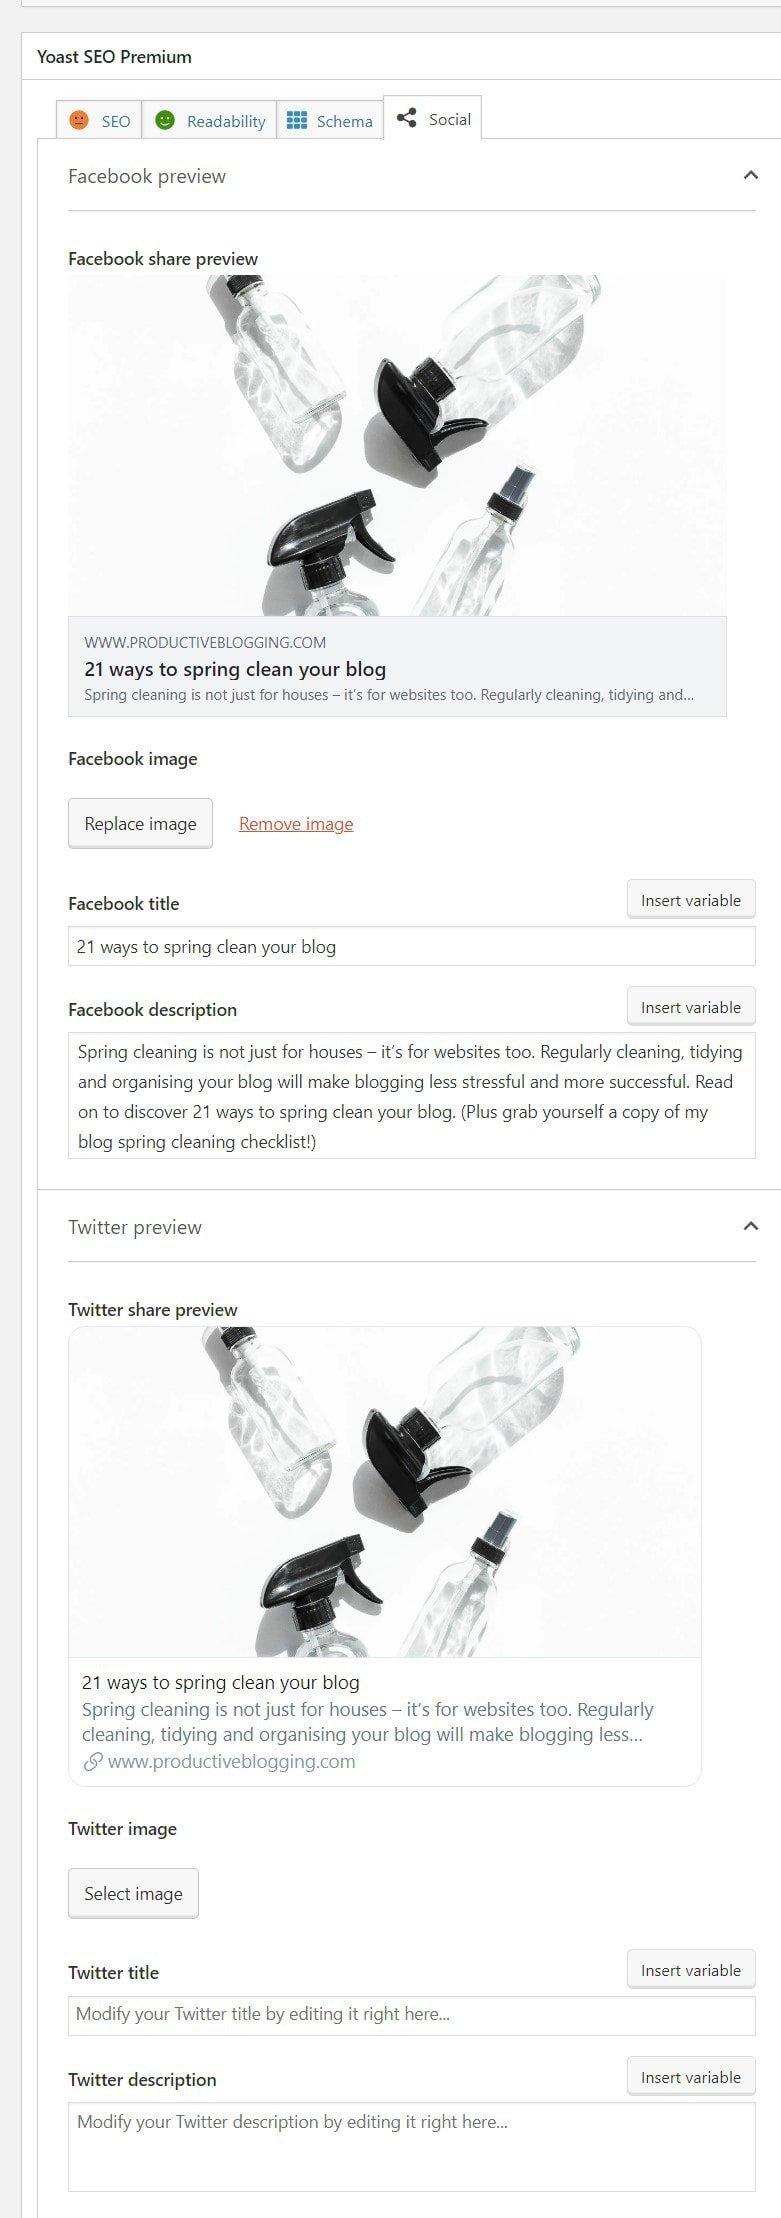 Yoast SEO Metabox Social